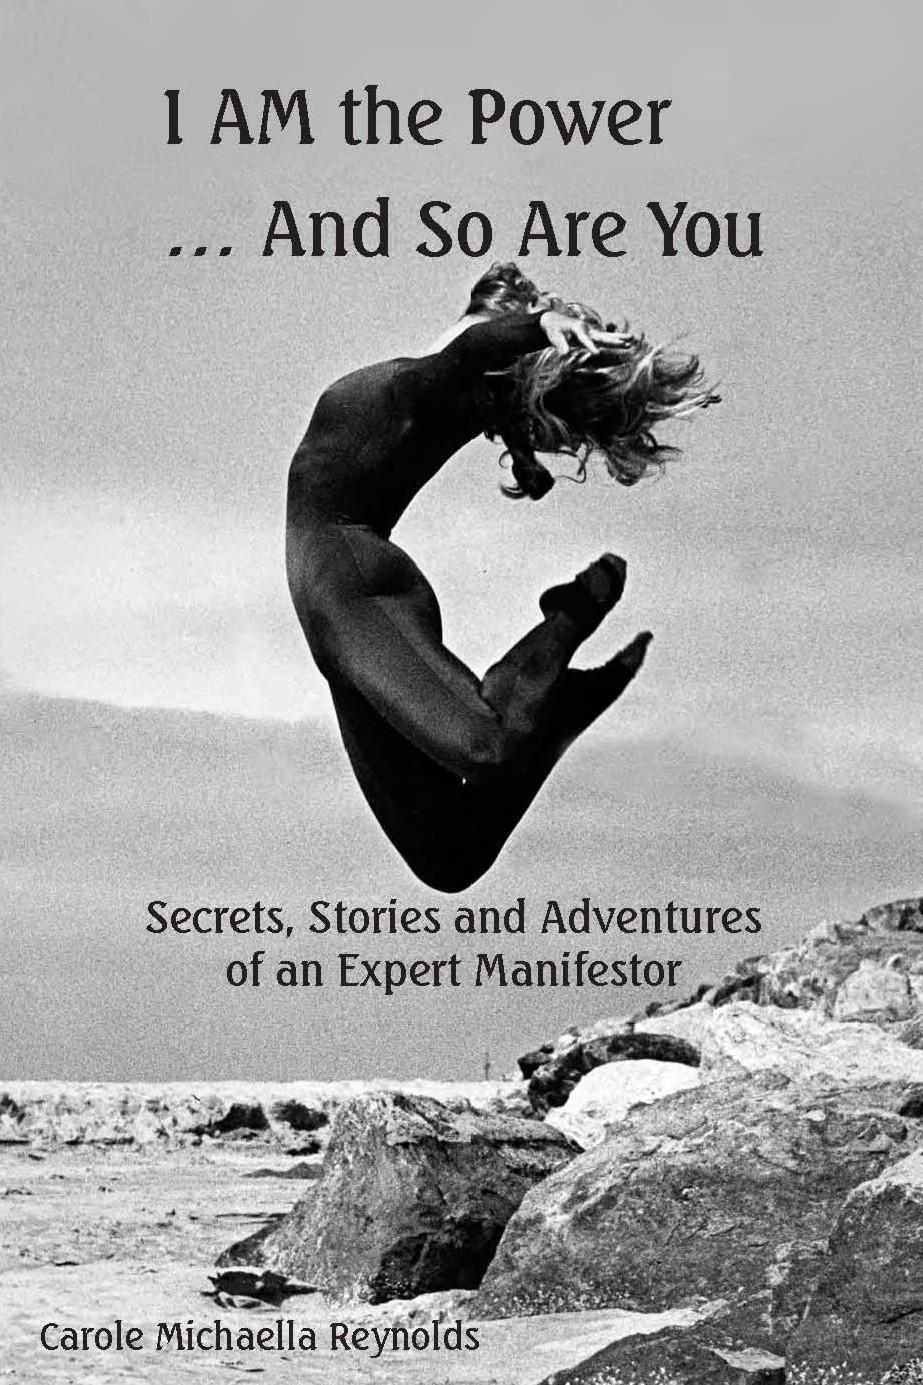 book cover 001